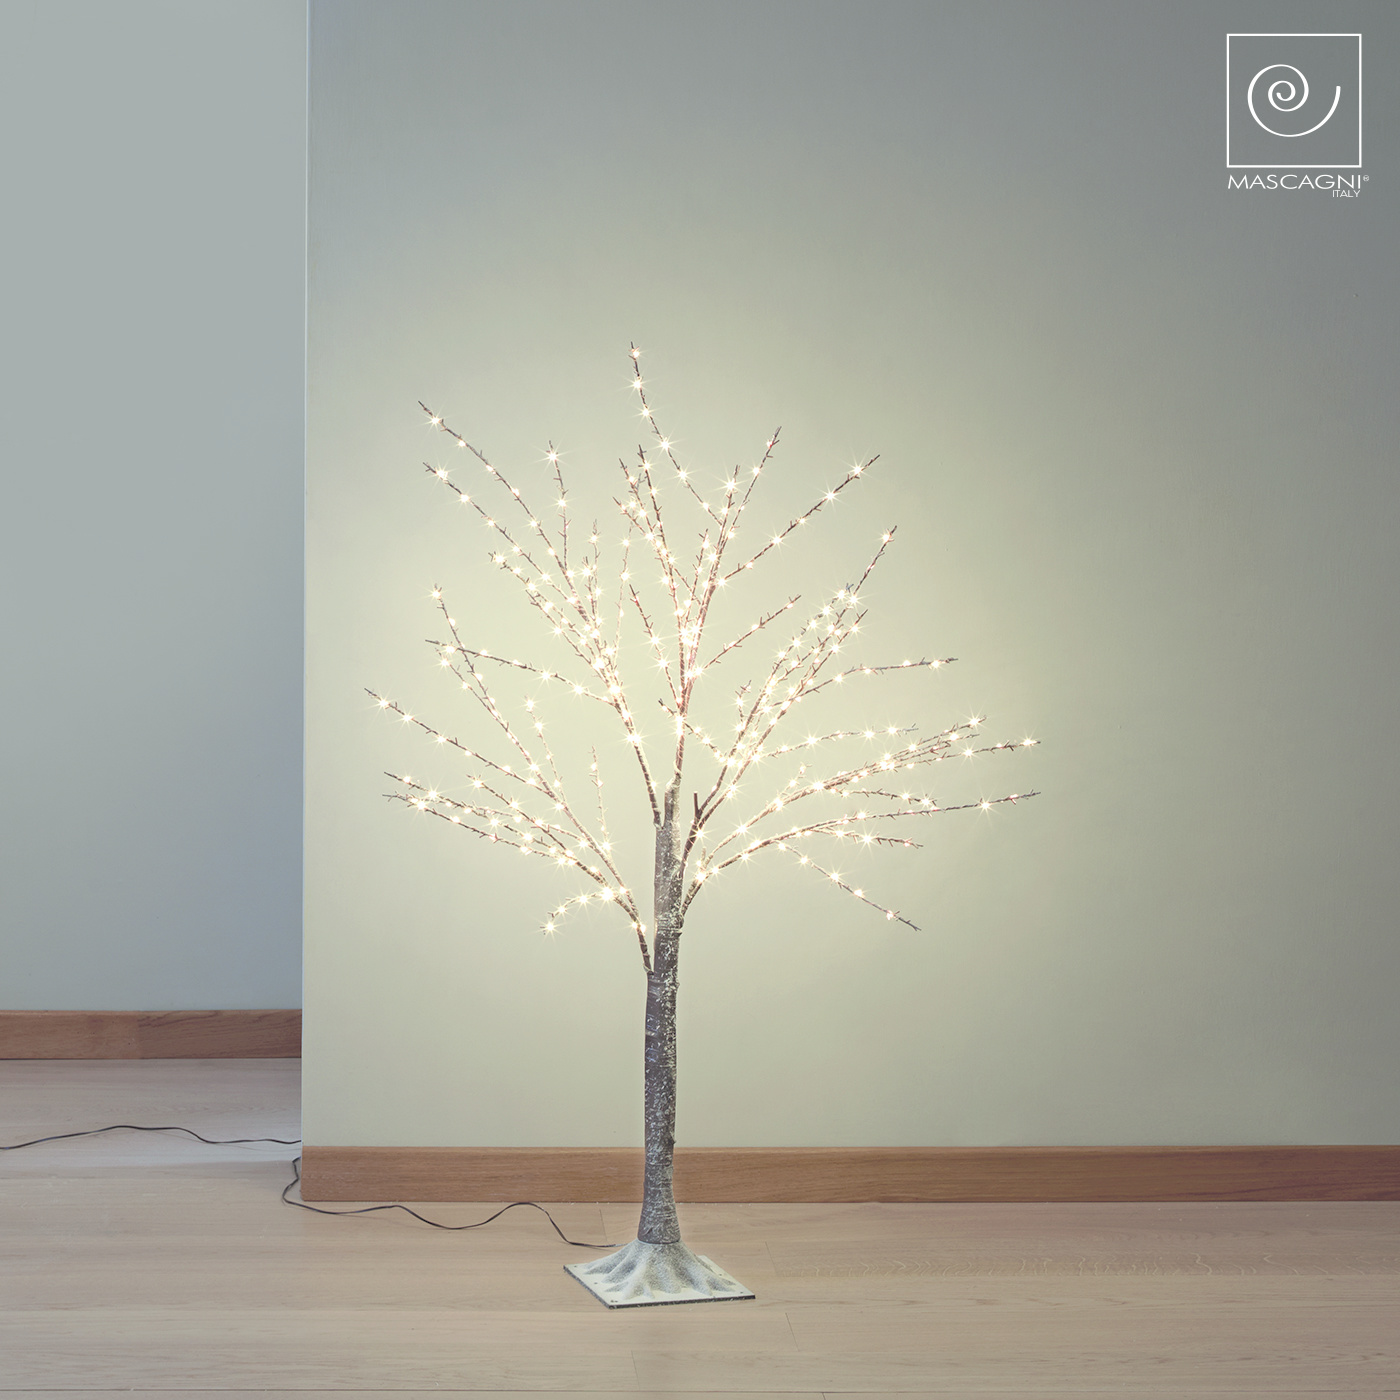 Art Mascagni LED TREE CM.100